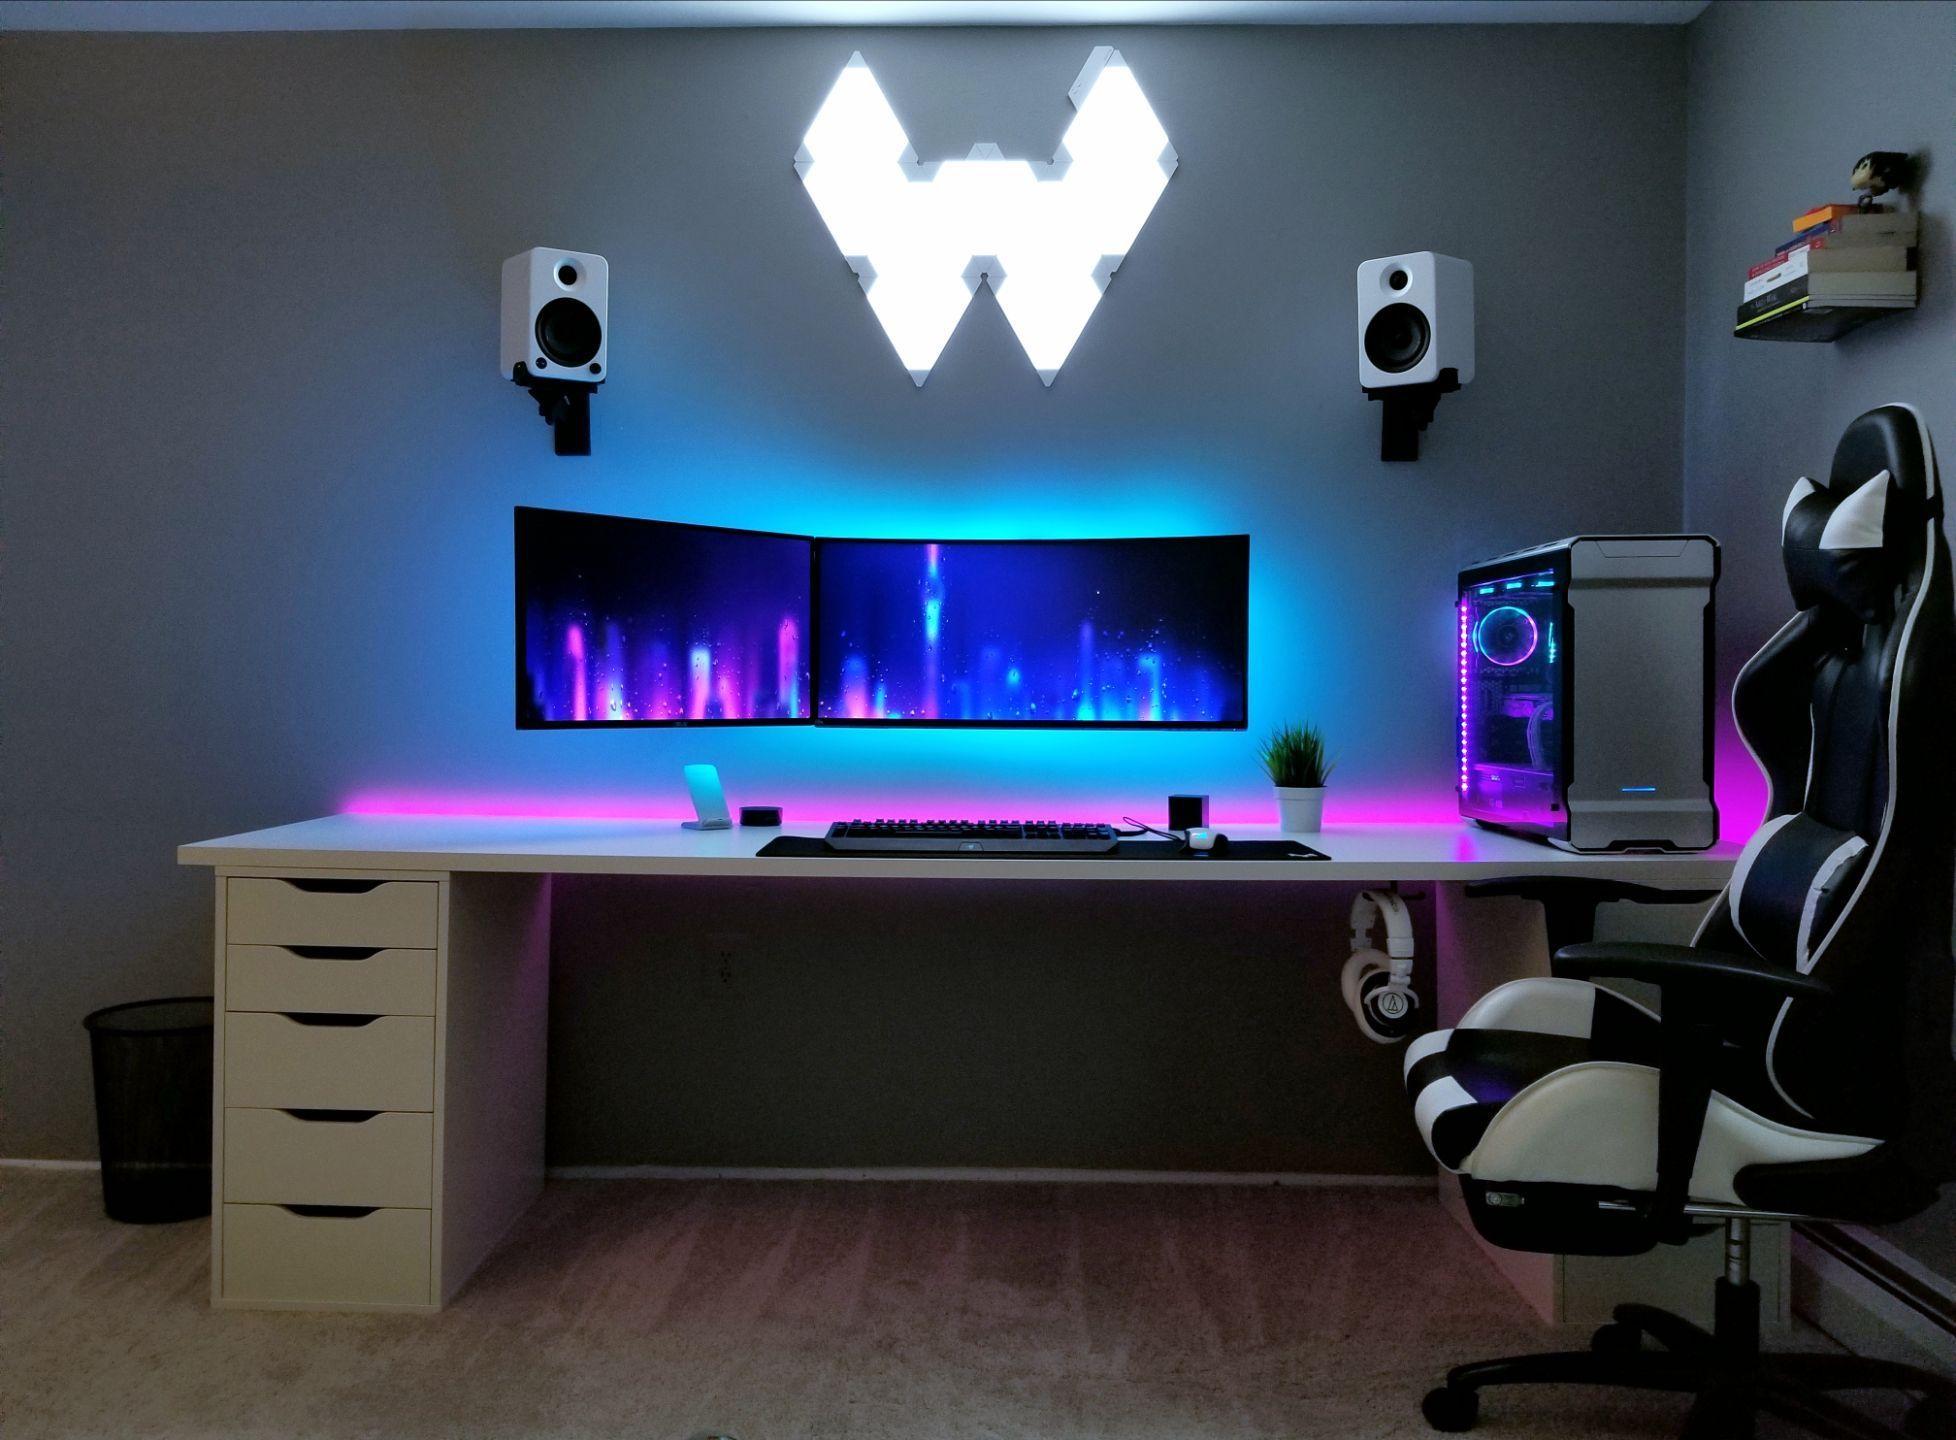 Gaming Room Accessories Gamingroom Gamingideas Gamingsetup Gaming Room Setup Room Setup Video Game Rooms